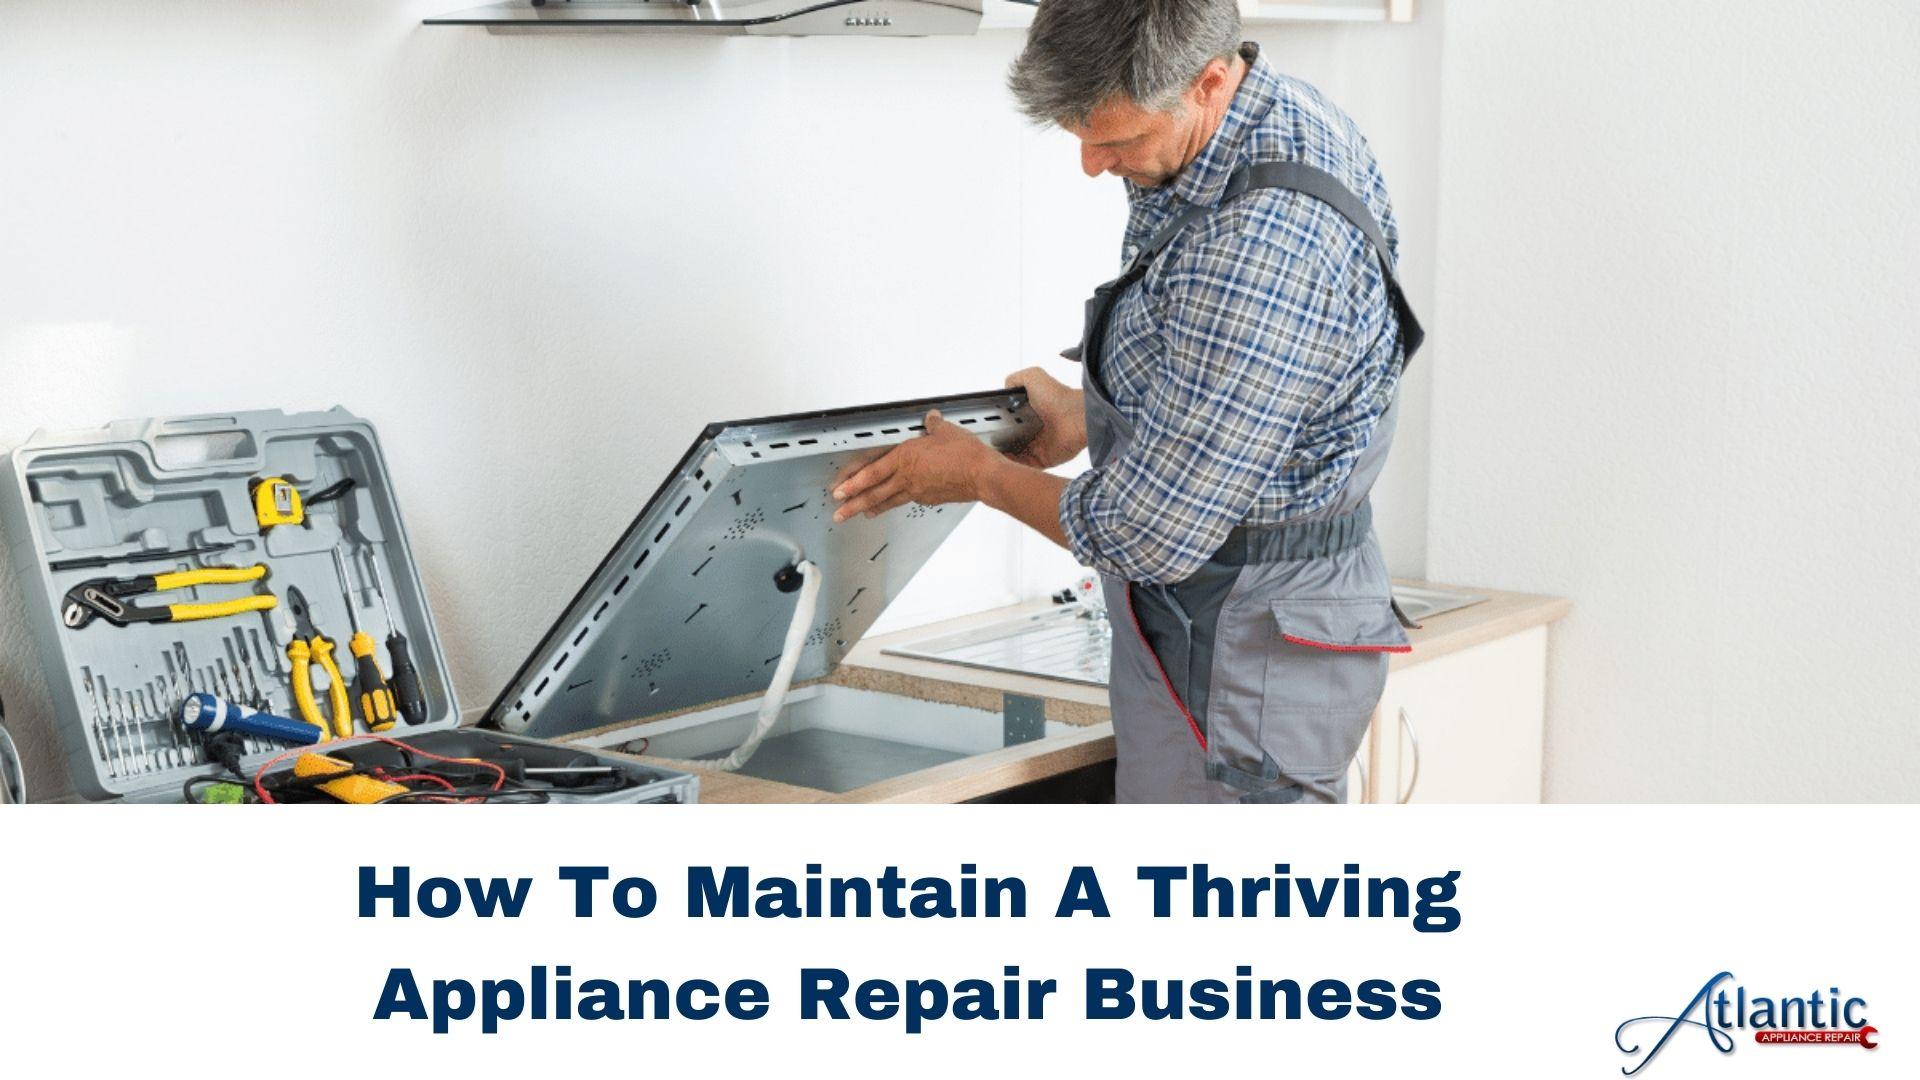 A Thriving Appliance Repair Business